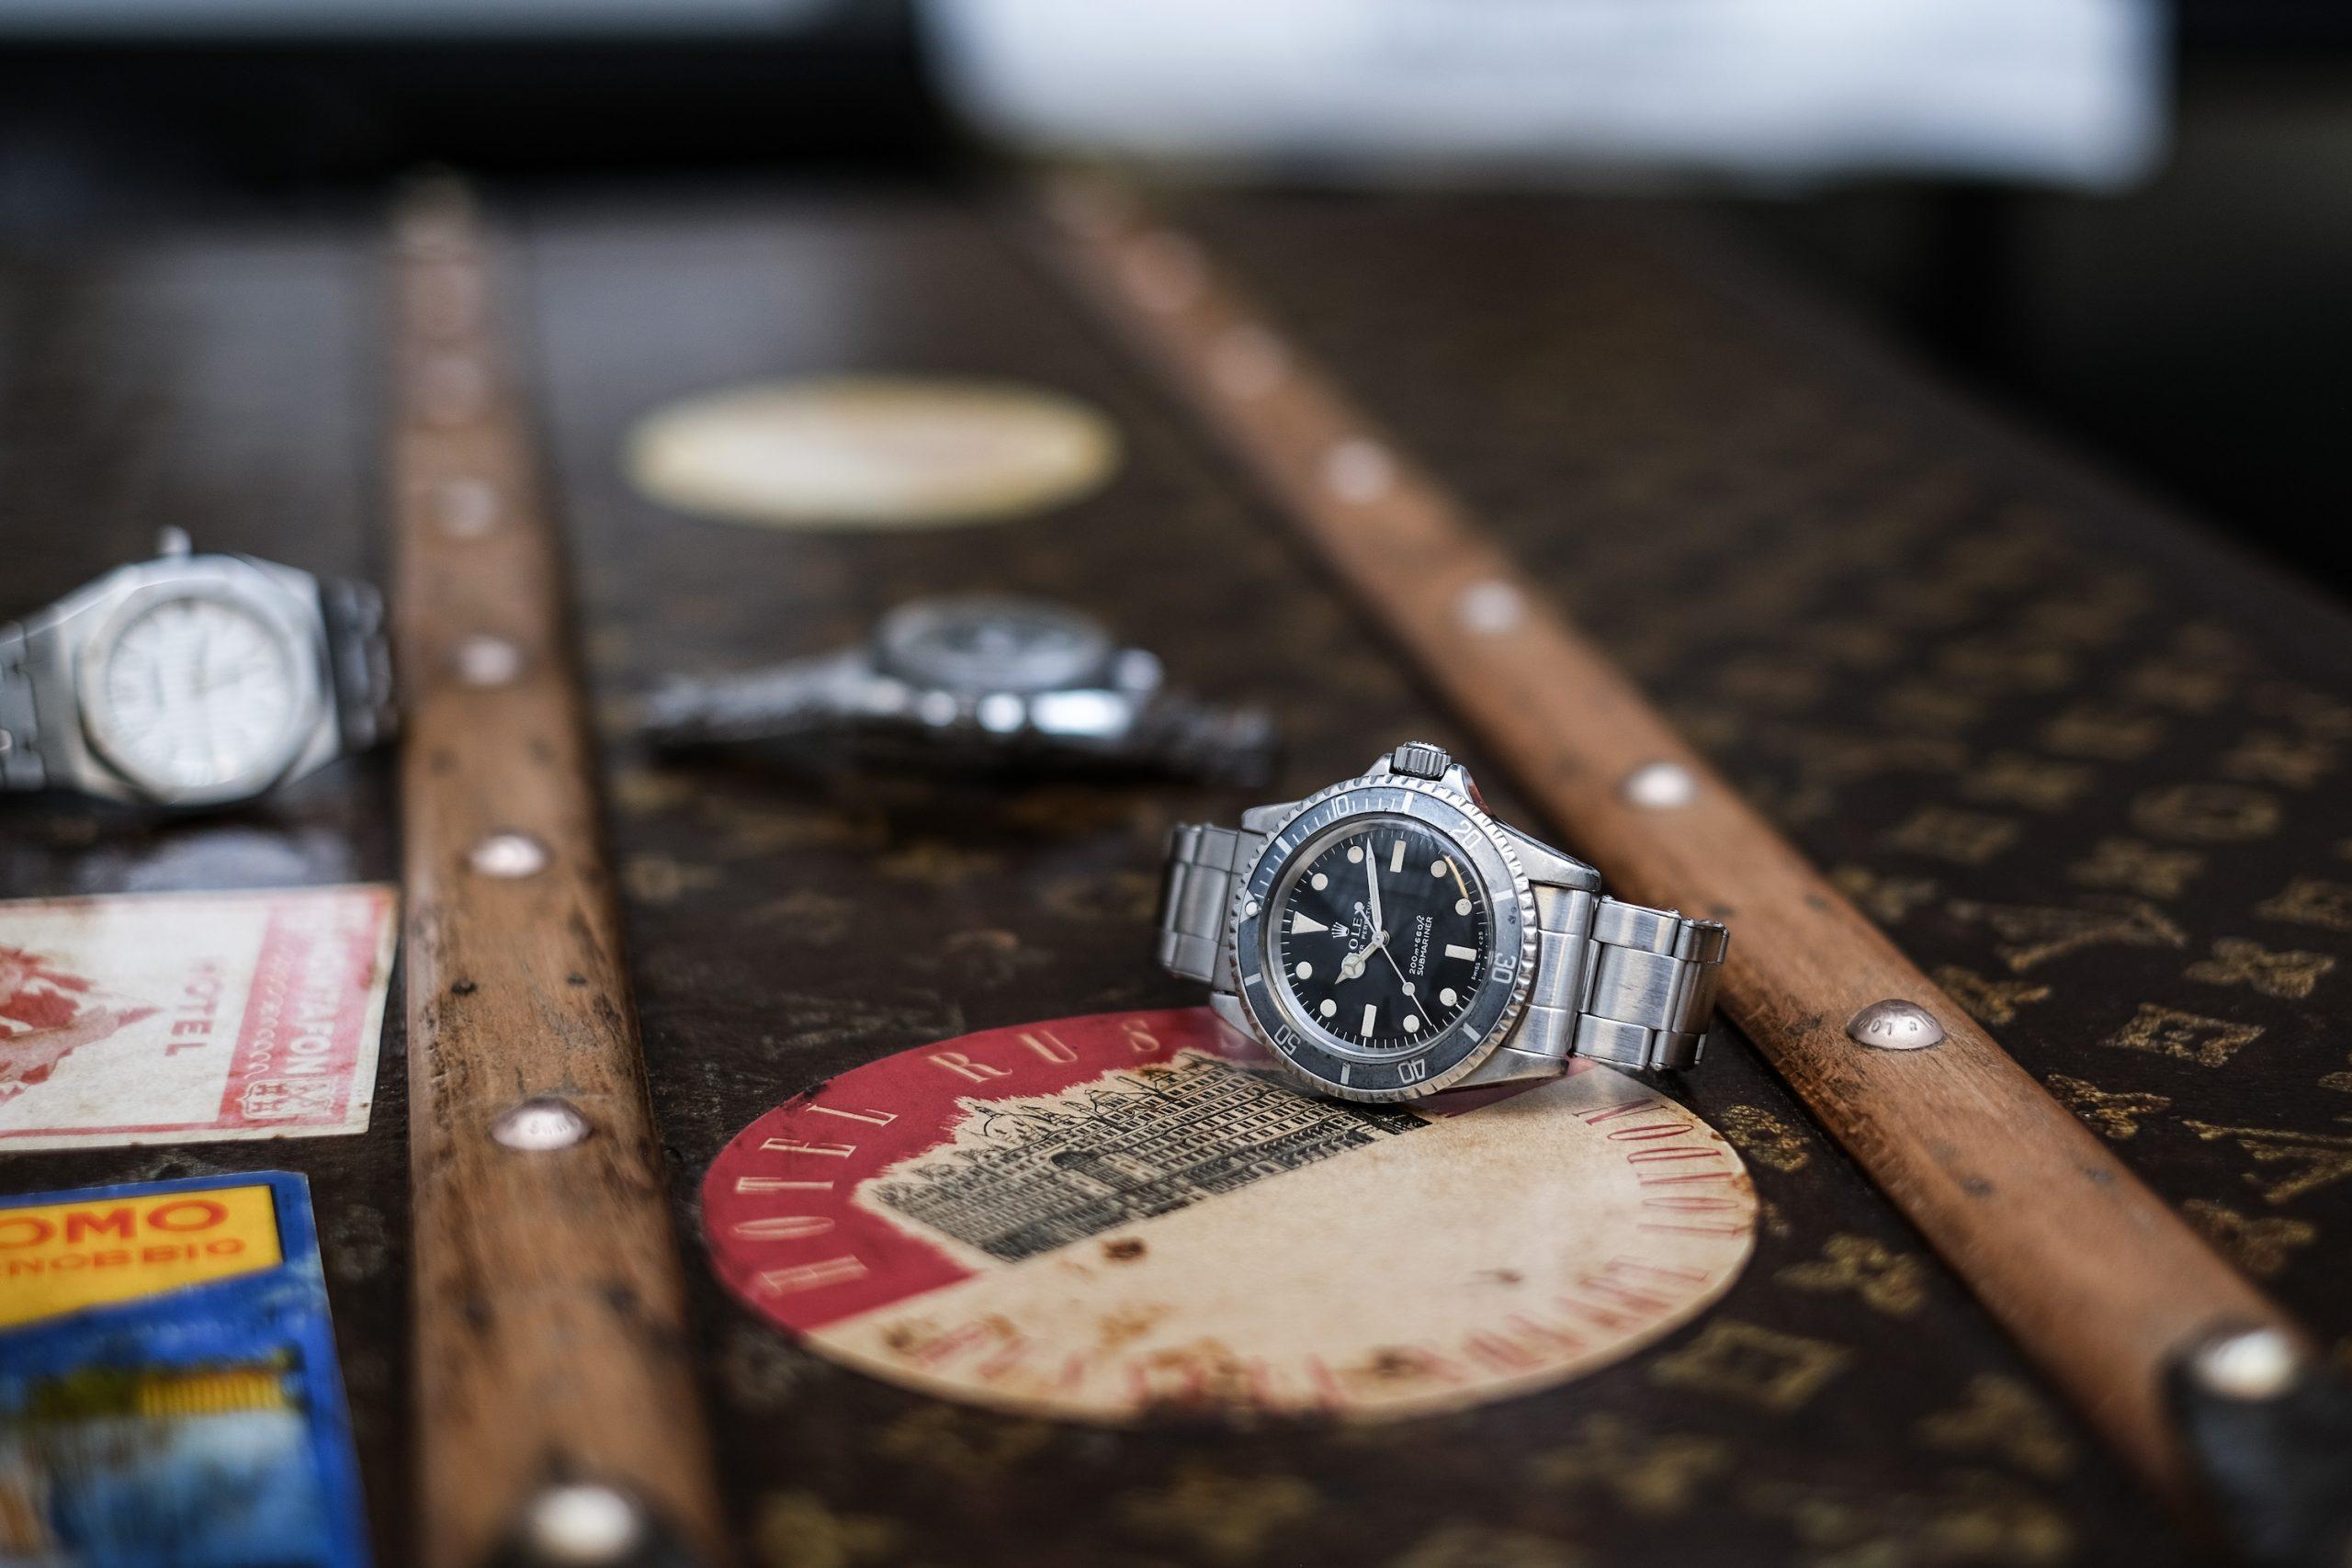 Montre Rolex Submariner 5513 meters first